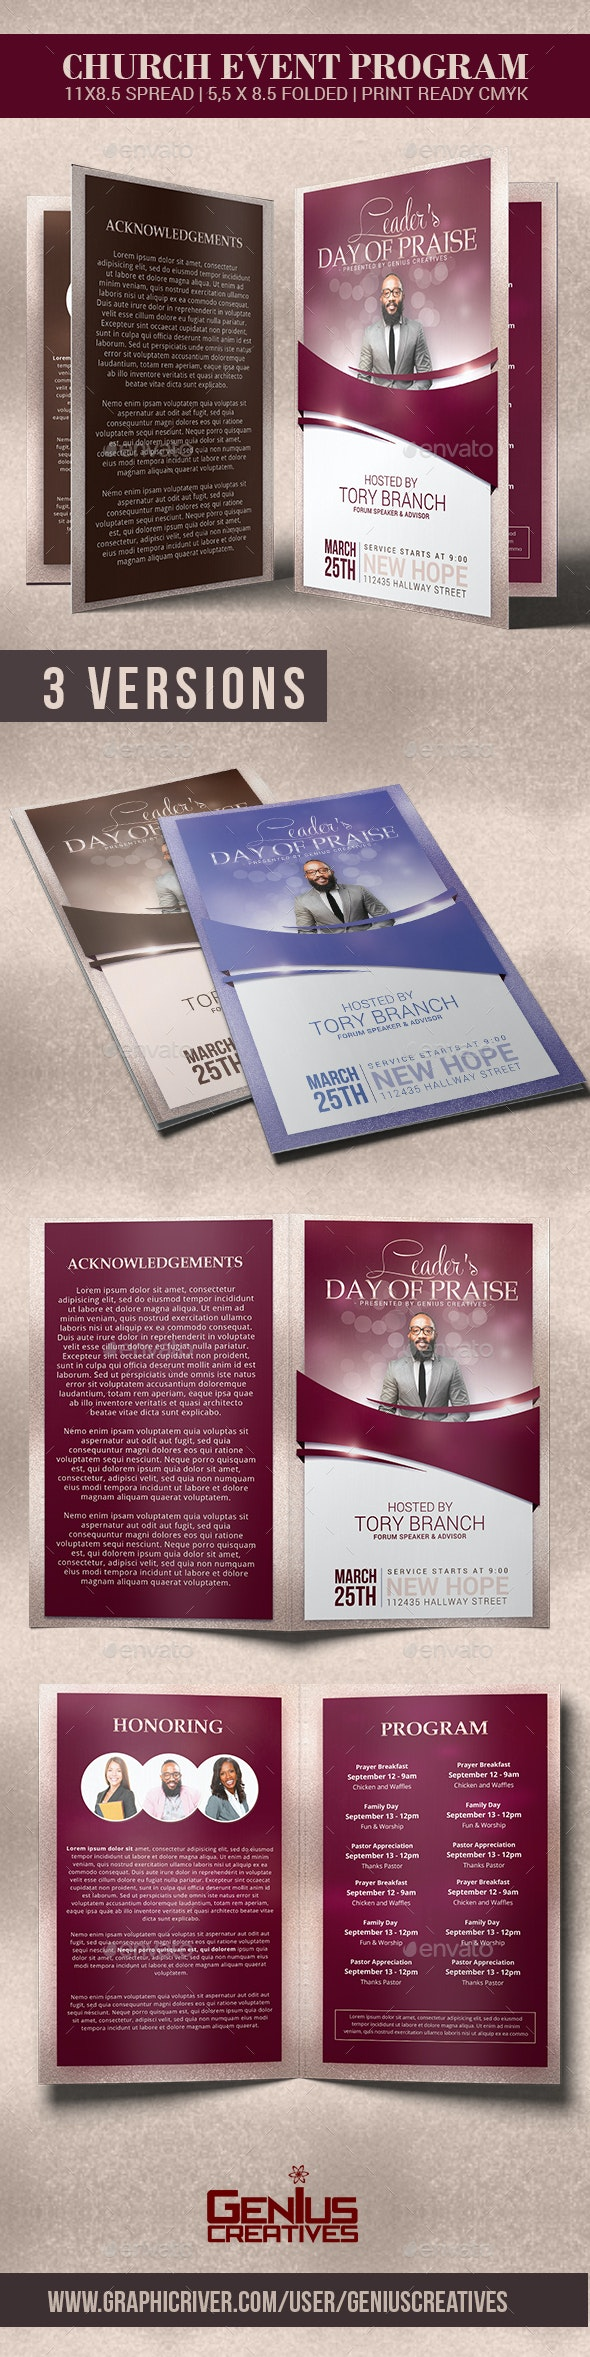 Leader's Day of Praise Church Program Template - Informational Brochures